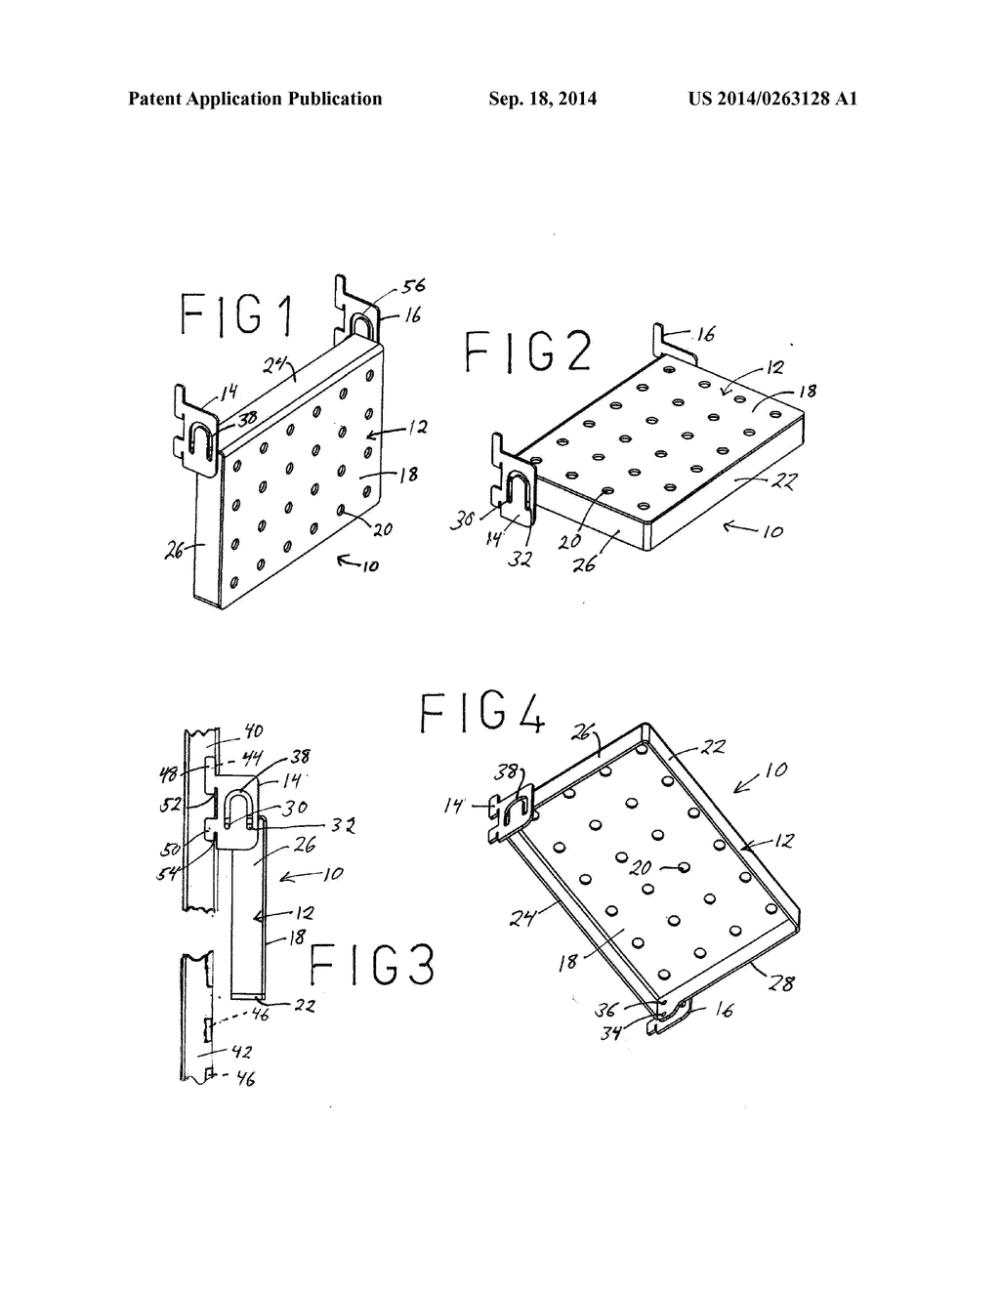 medium resolution of convertible gondola shelving diagram schematic and image 02 rowing shell diagram diagram of gondola